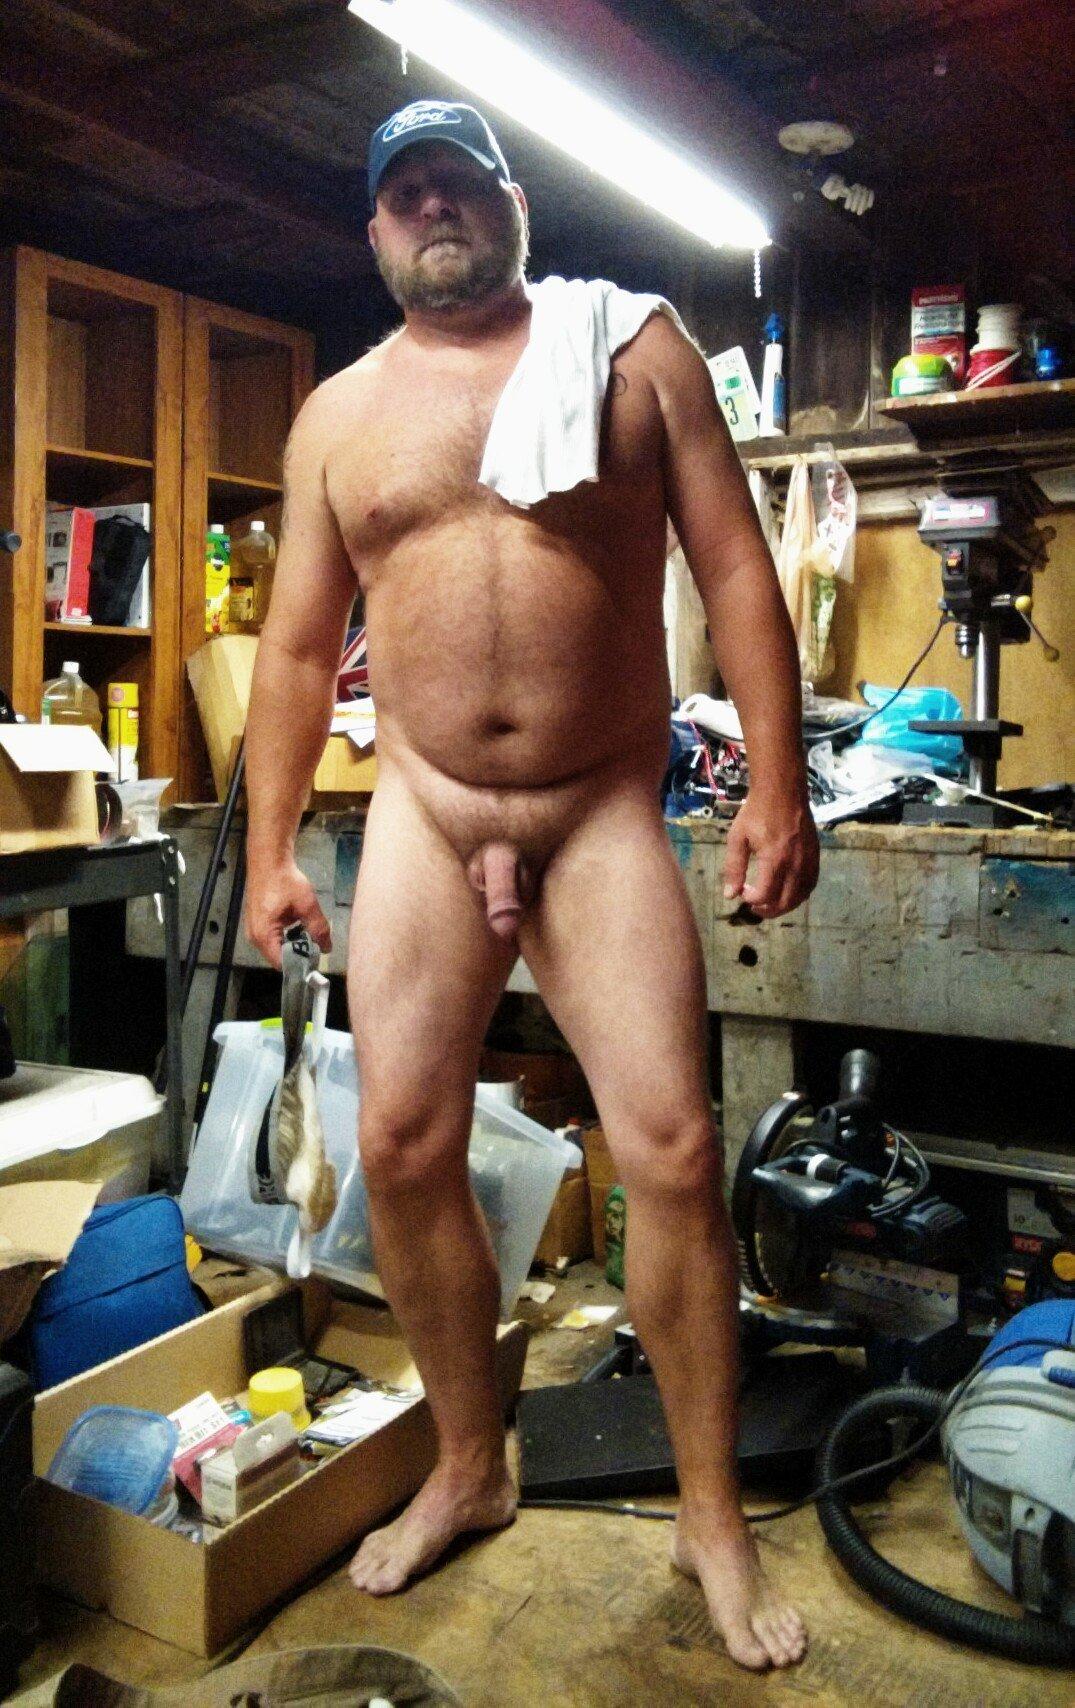 2018-10-17 08:06:34 - dirtydads filthyfathers whaddaya wanna do boylovesdaddybears http://www.neofic.com